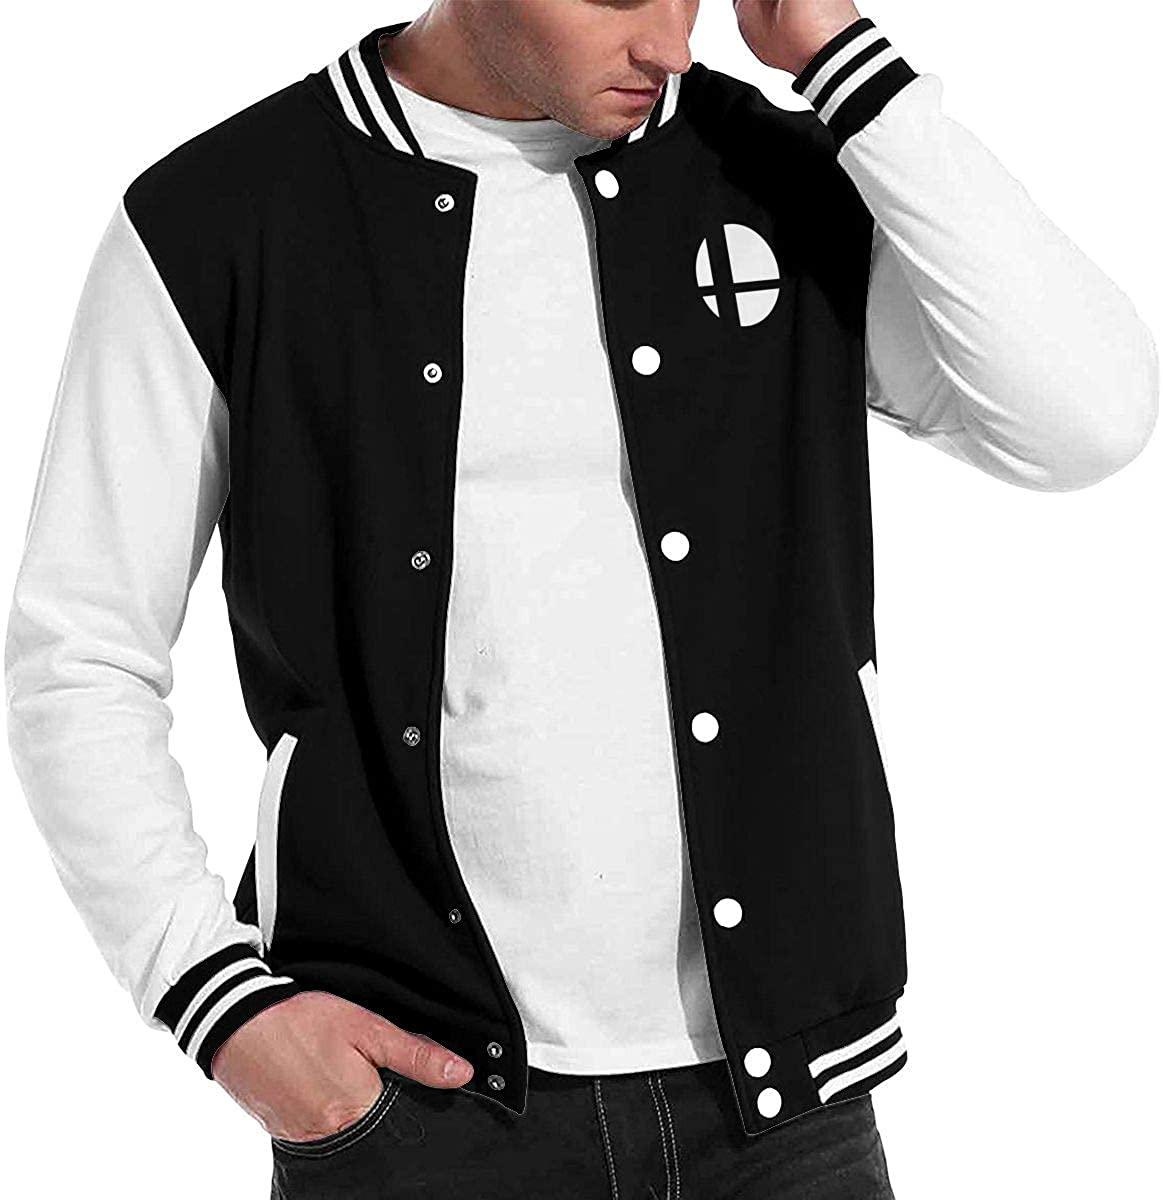 Super Smash Bros Logo Mens & Womens Vintage Hoodie Baseball Uniform Jacket Sport Coat